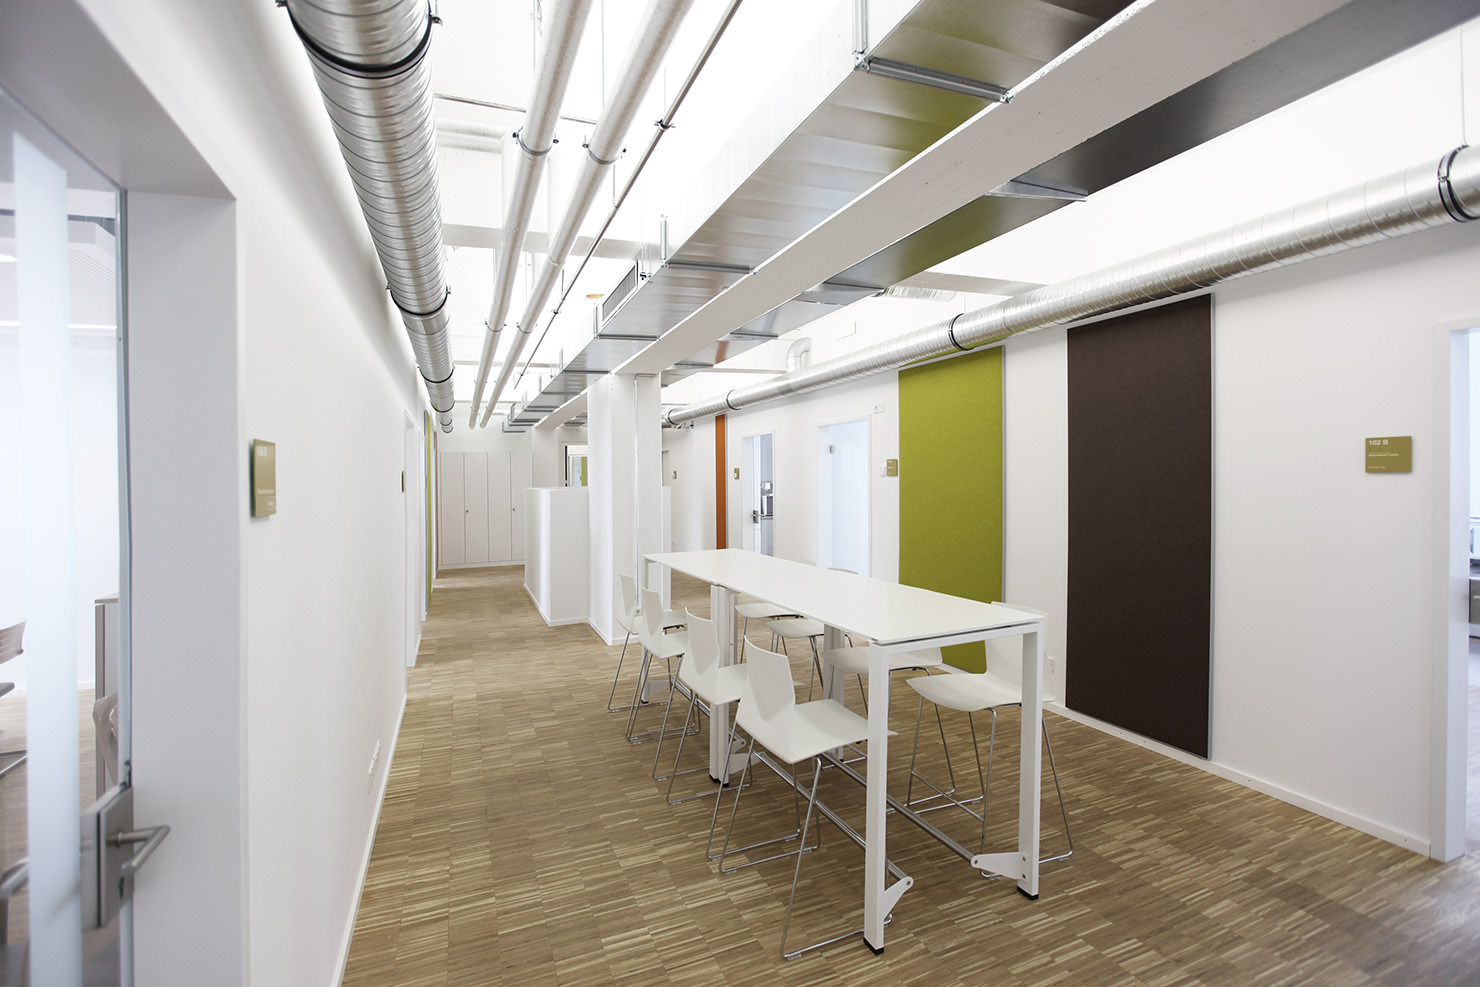 gewofag cba clemens bachmann architekten m nchen. Black Bedroom Furniture Sets. Home Design Ideas